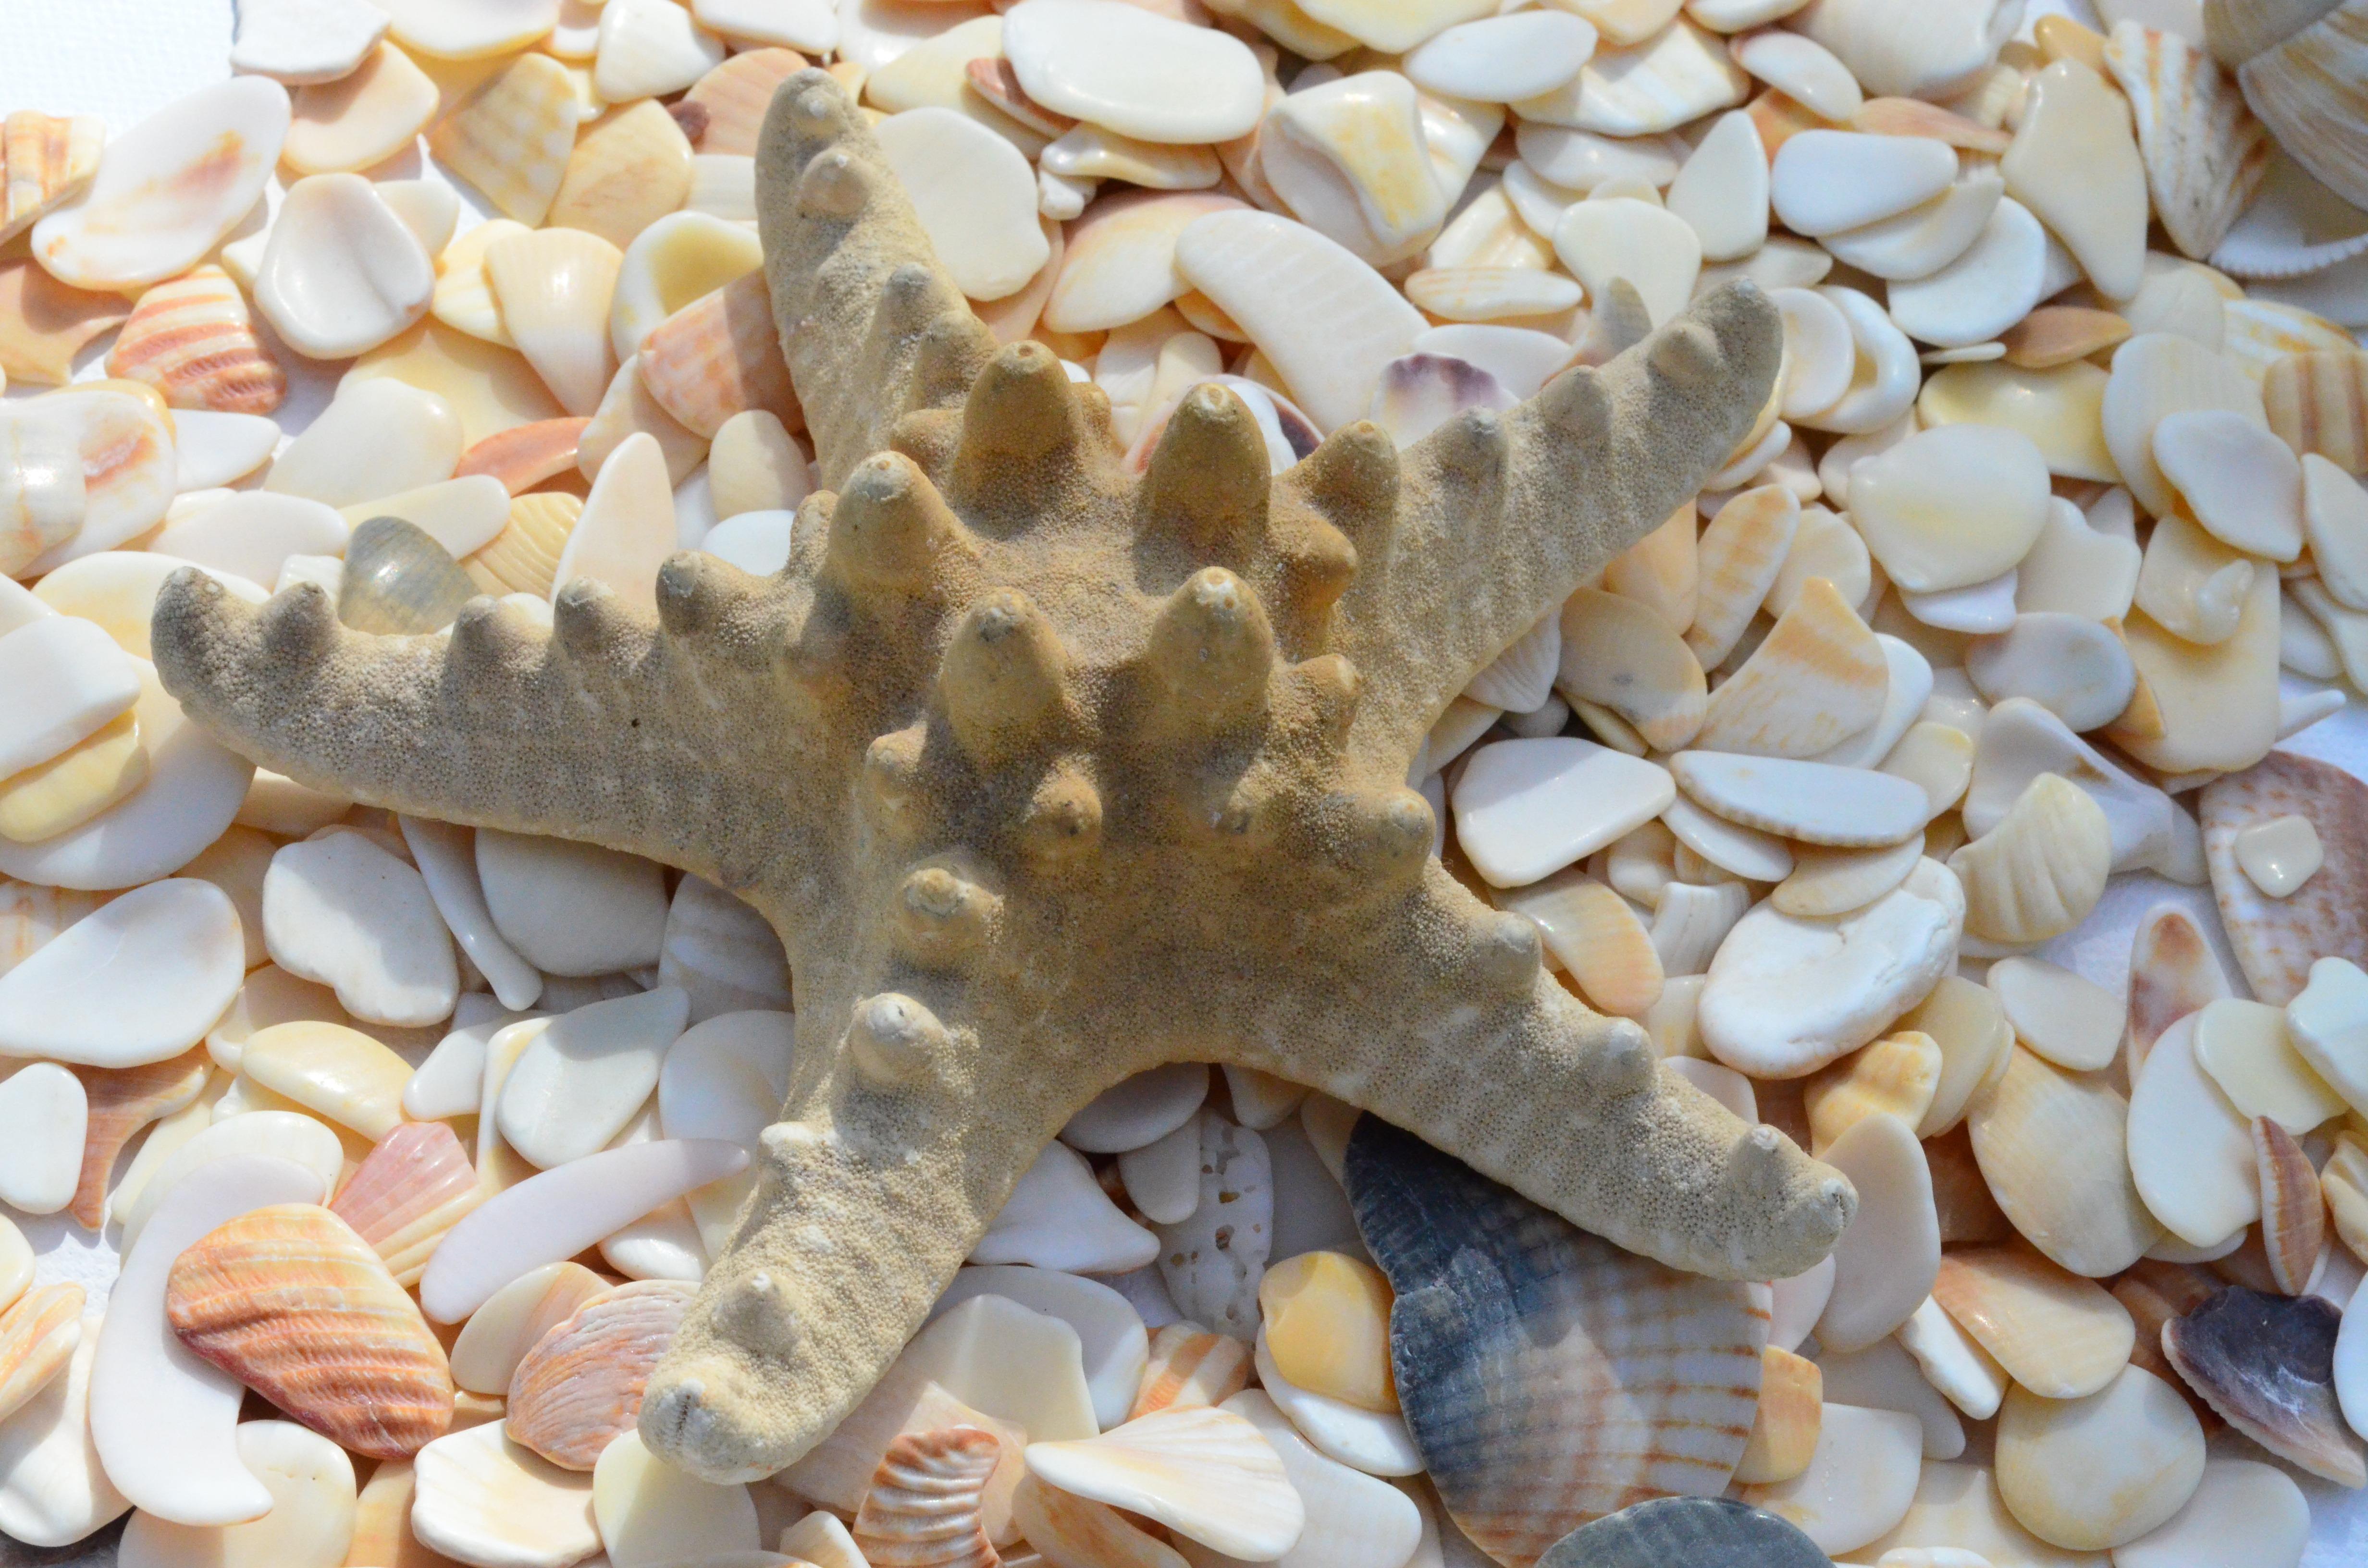 Новым, картинки морские звезды и ракушки